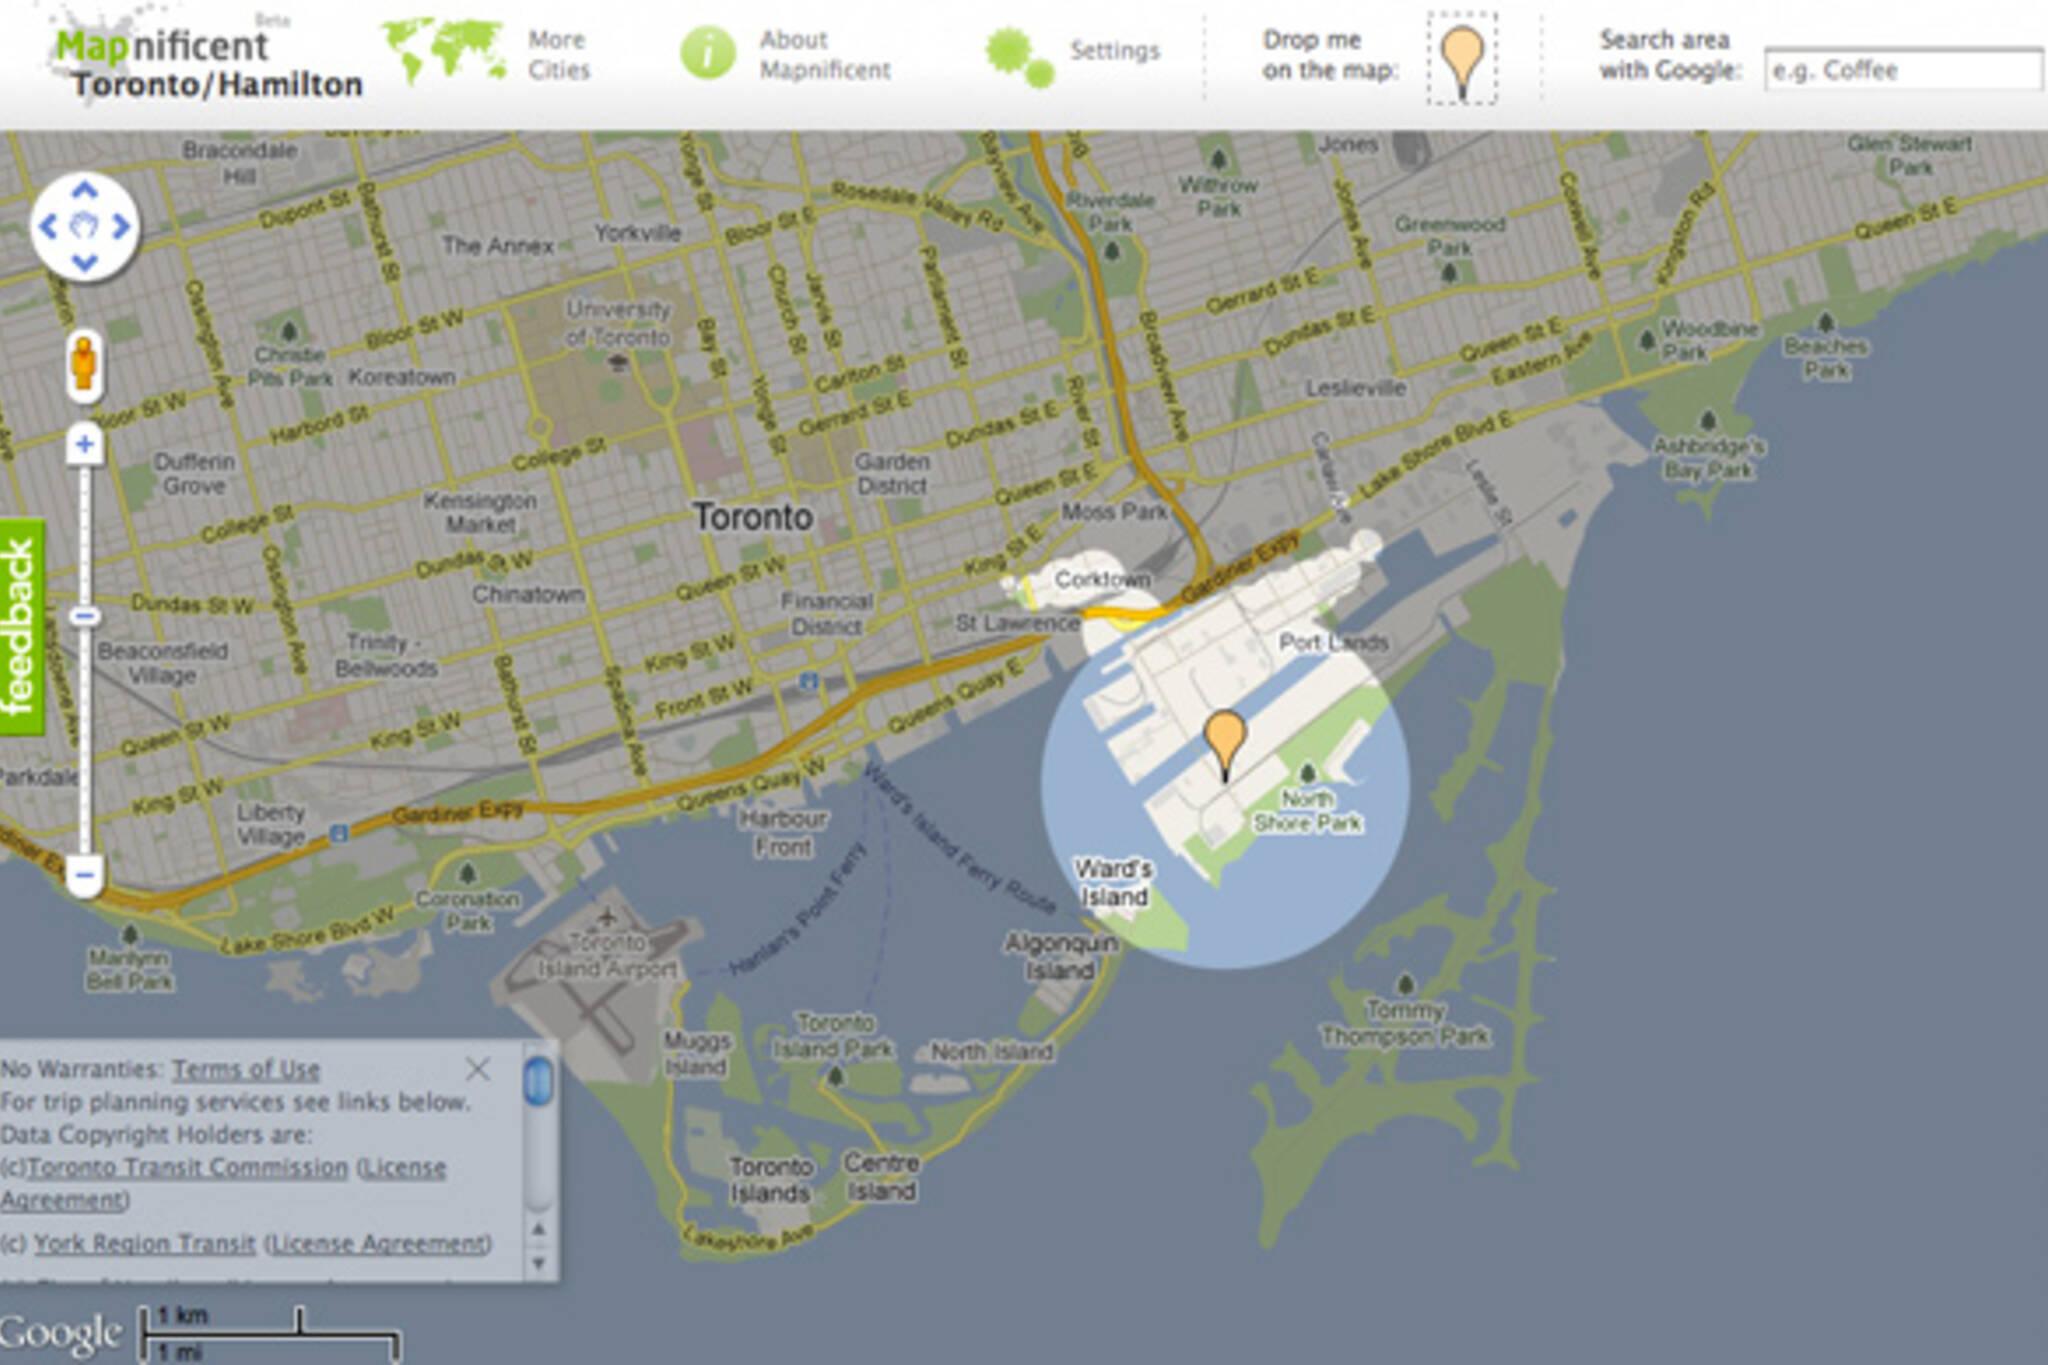 Mapnificent Public Transit App